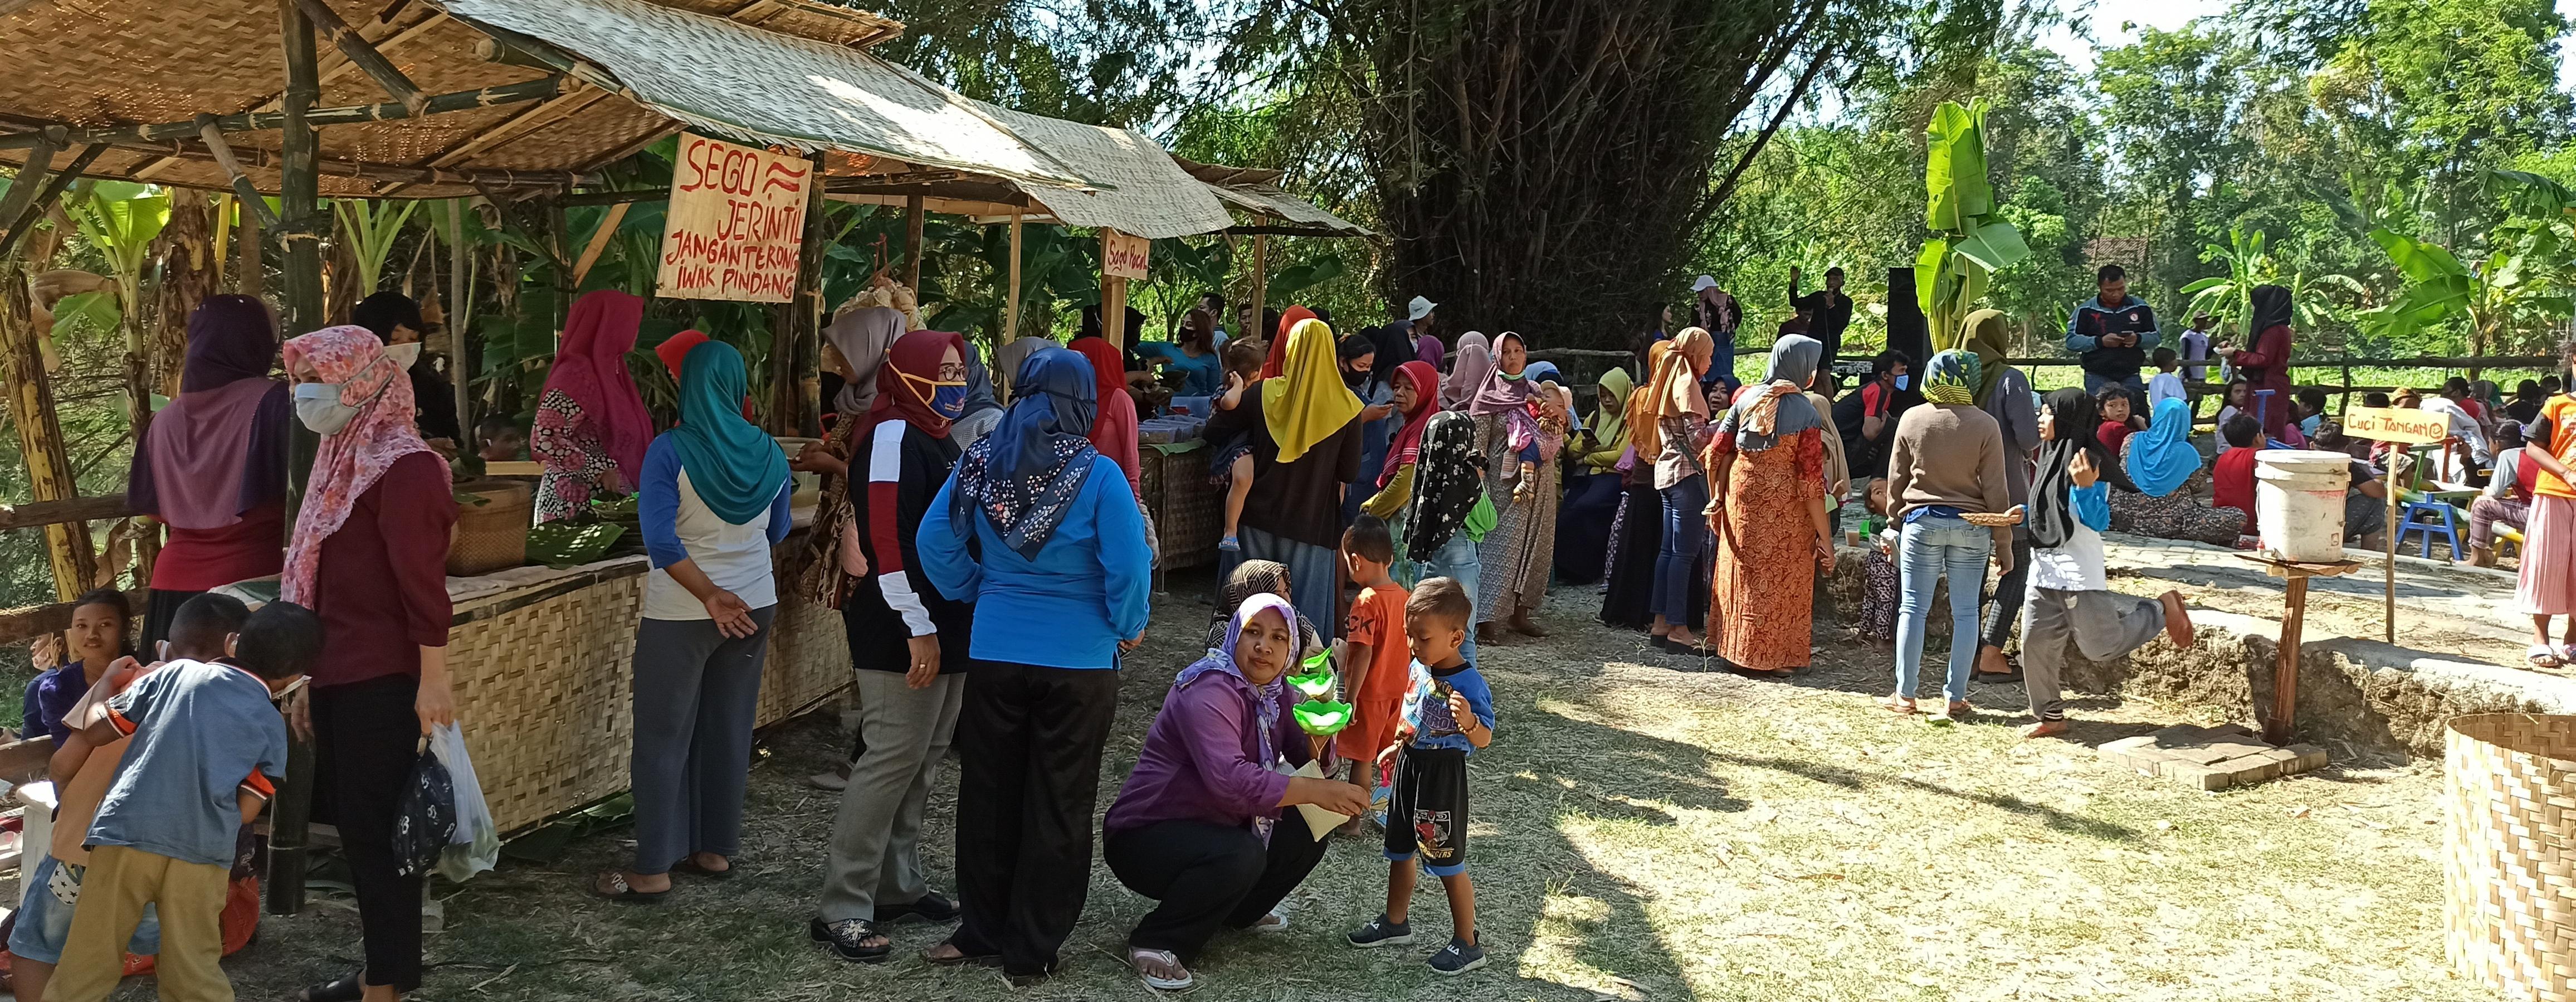 Wisata Perahu Cinta Desa Semawot Sukosewu <BR>Nikmati Wisata dan Kuliner Khas setiap Hari Minggu Pagi